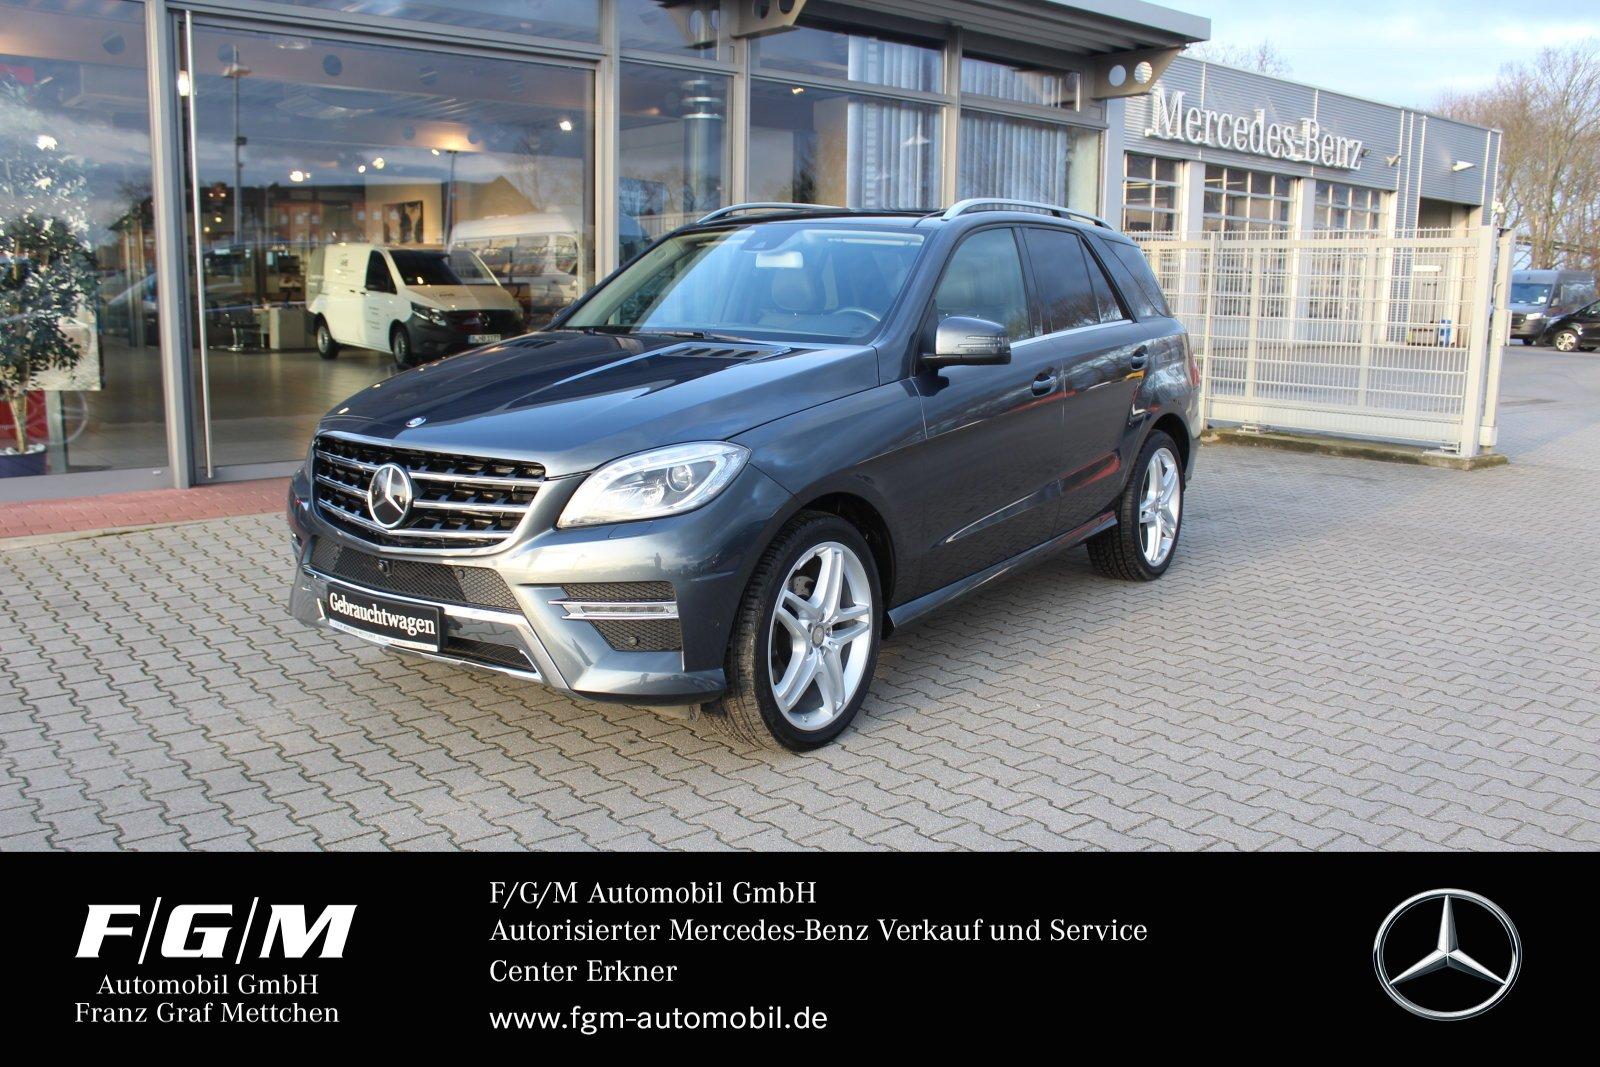 Mercedes-Benz ML 350 BT COMAND/Comand/ILS/PanoD/Distr/Airmatic, Jahr 2015, Diesel